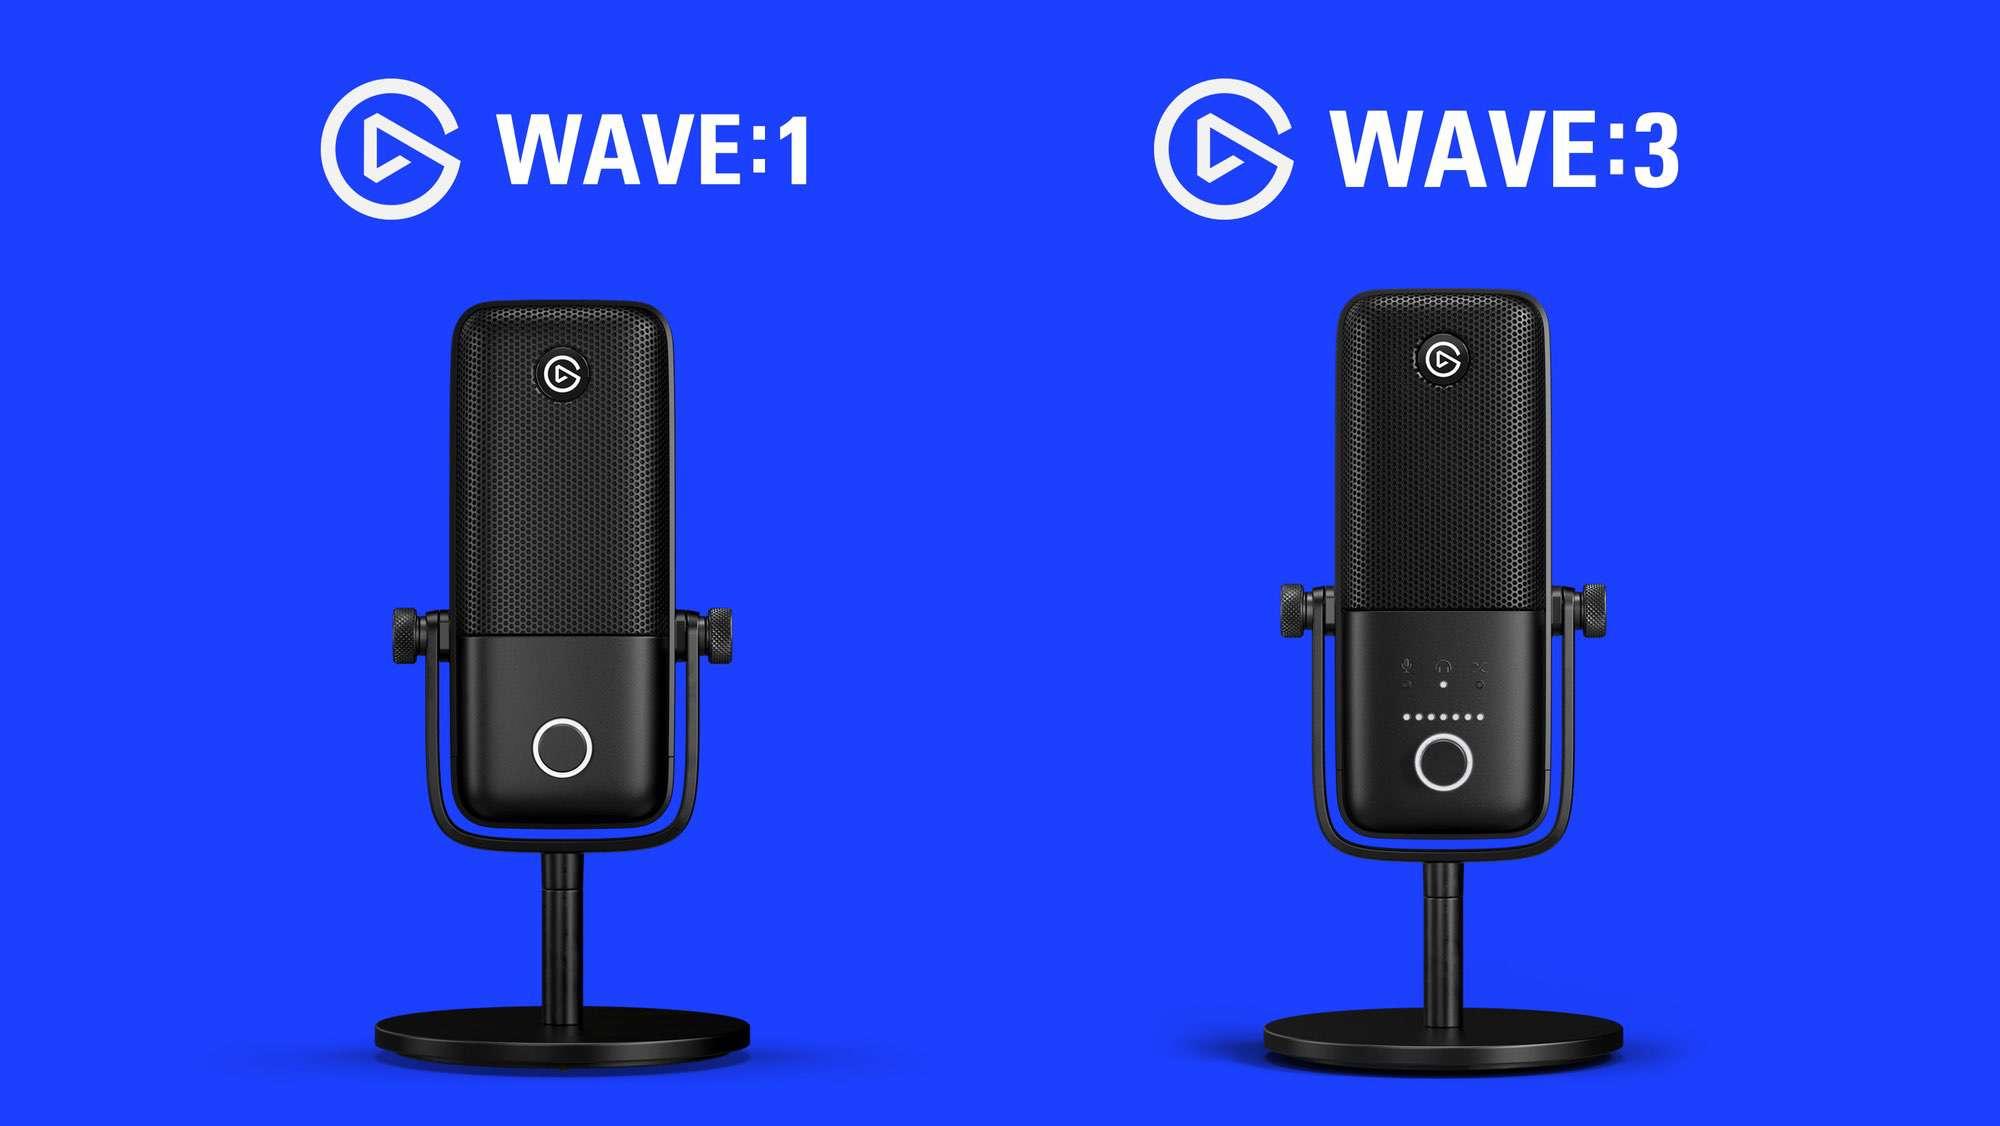 Elgato Wave:1 vs Wave:3